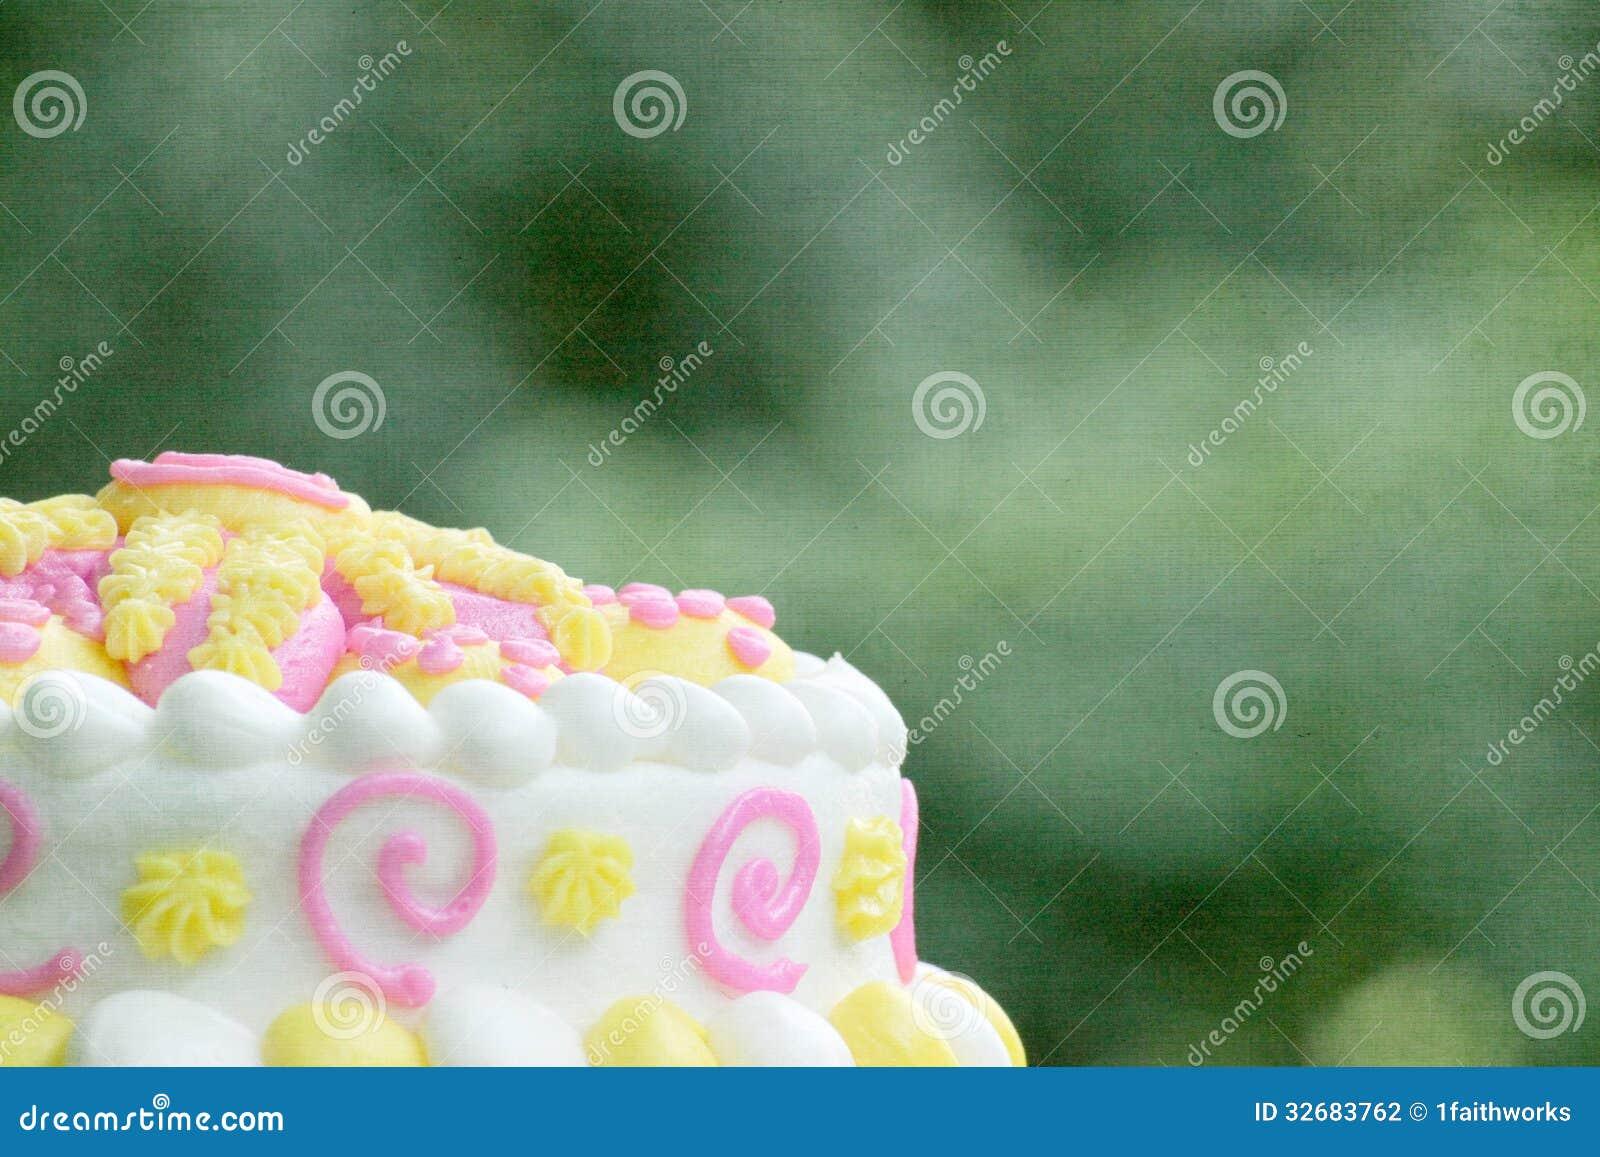 Birthday Cake Background stock photo  Image of texture